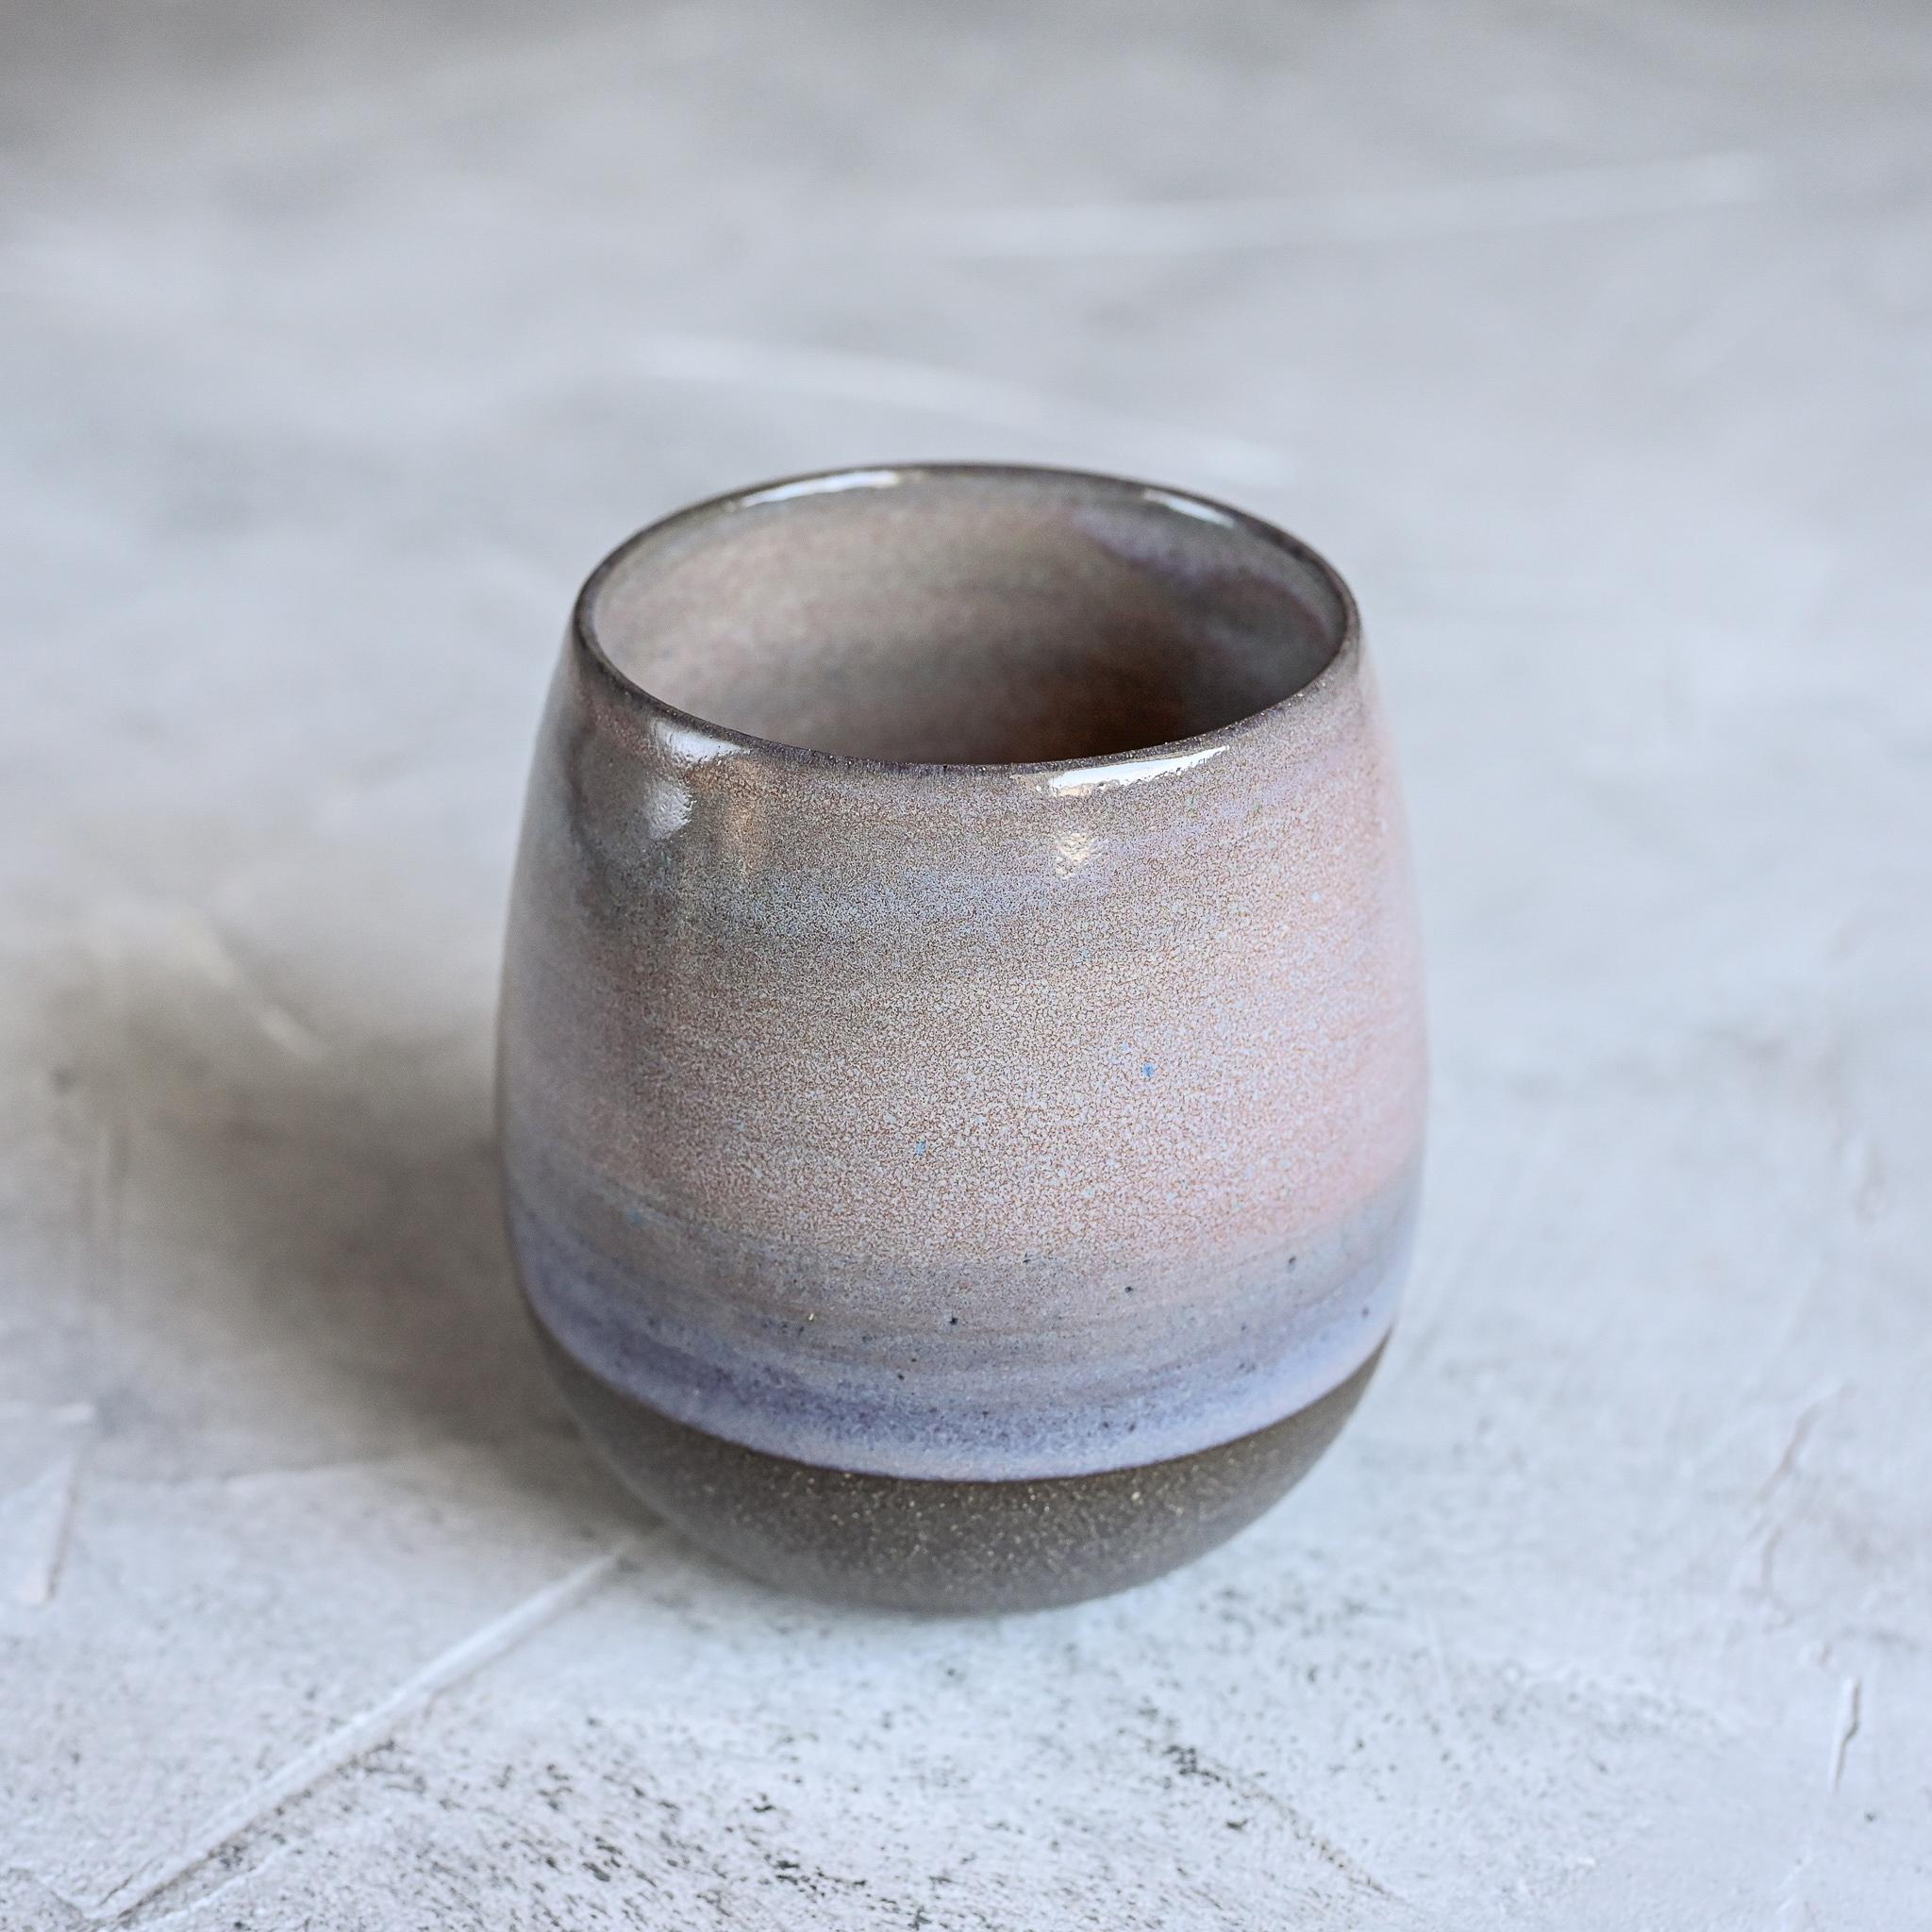 картинка Керамический стакан Марии Левиной малый 7 - DishWishes.Ru